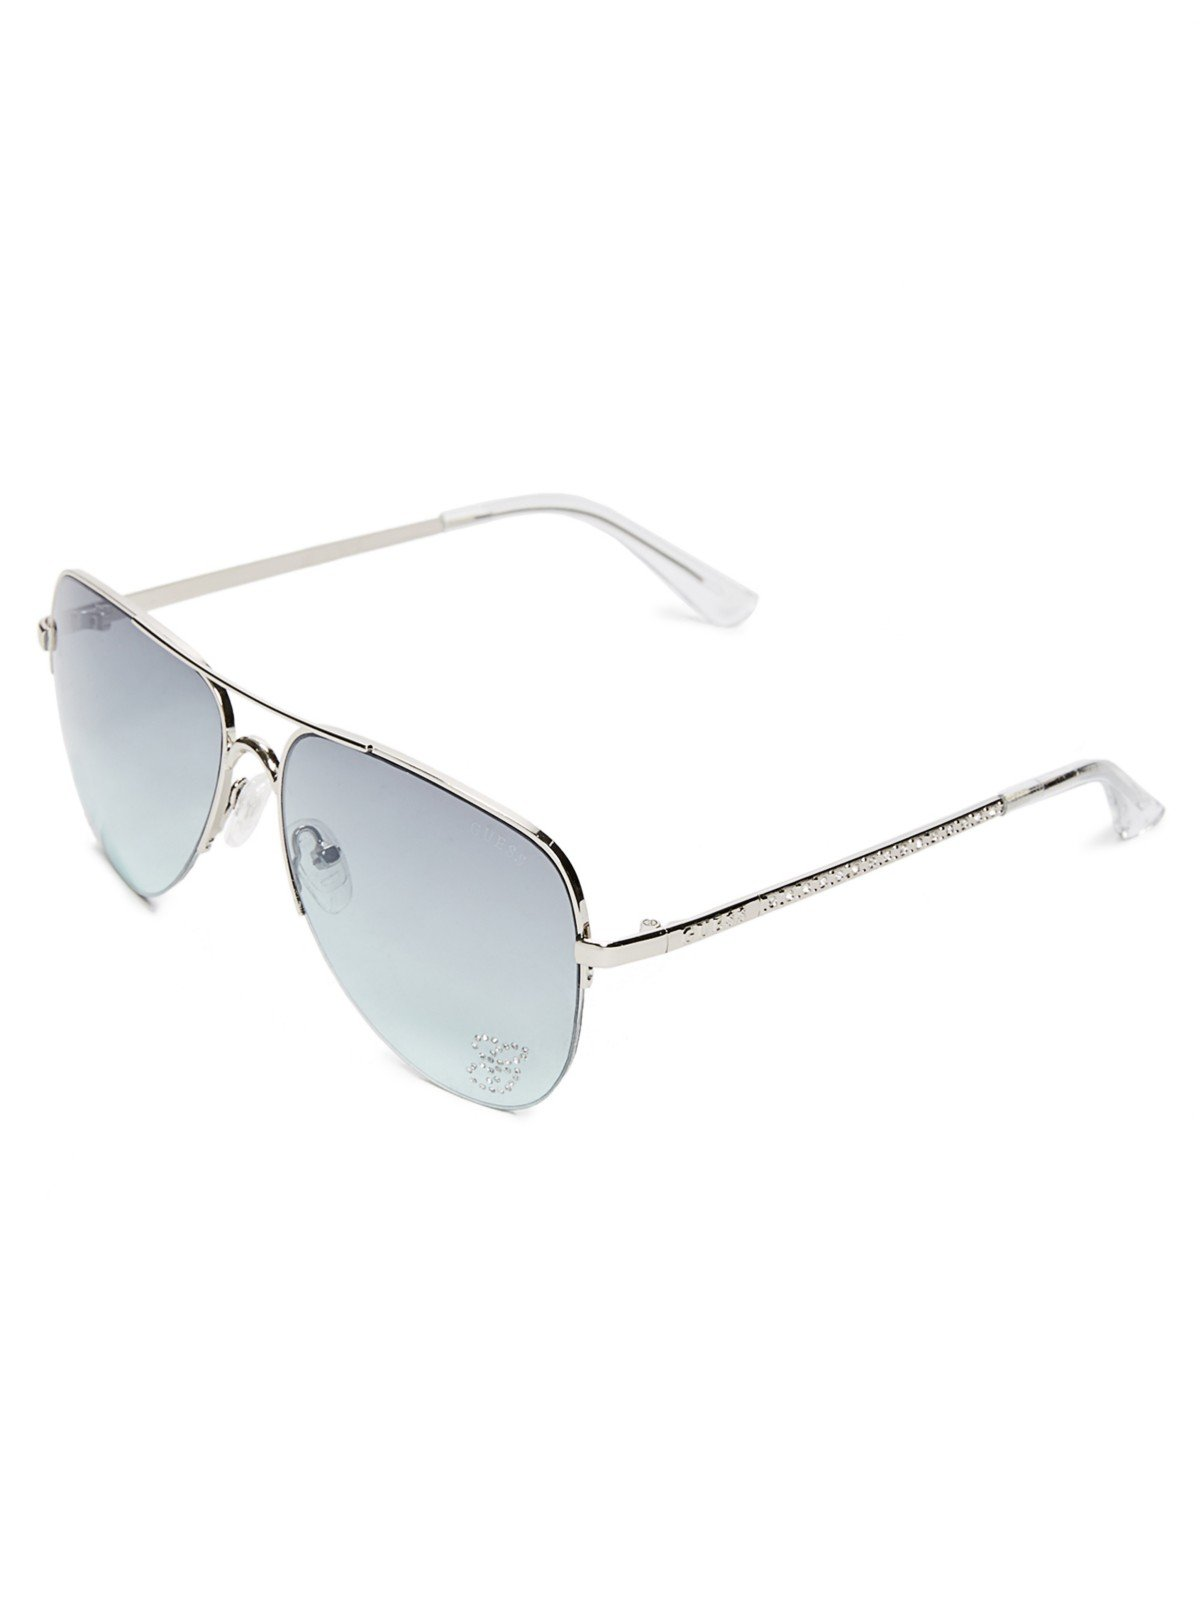 b0533f2f4ba GUESS Factory Women s Women s Sparkle Metal Aviator Sunglasses